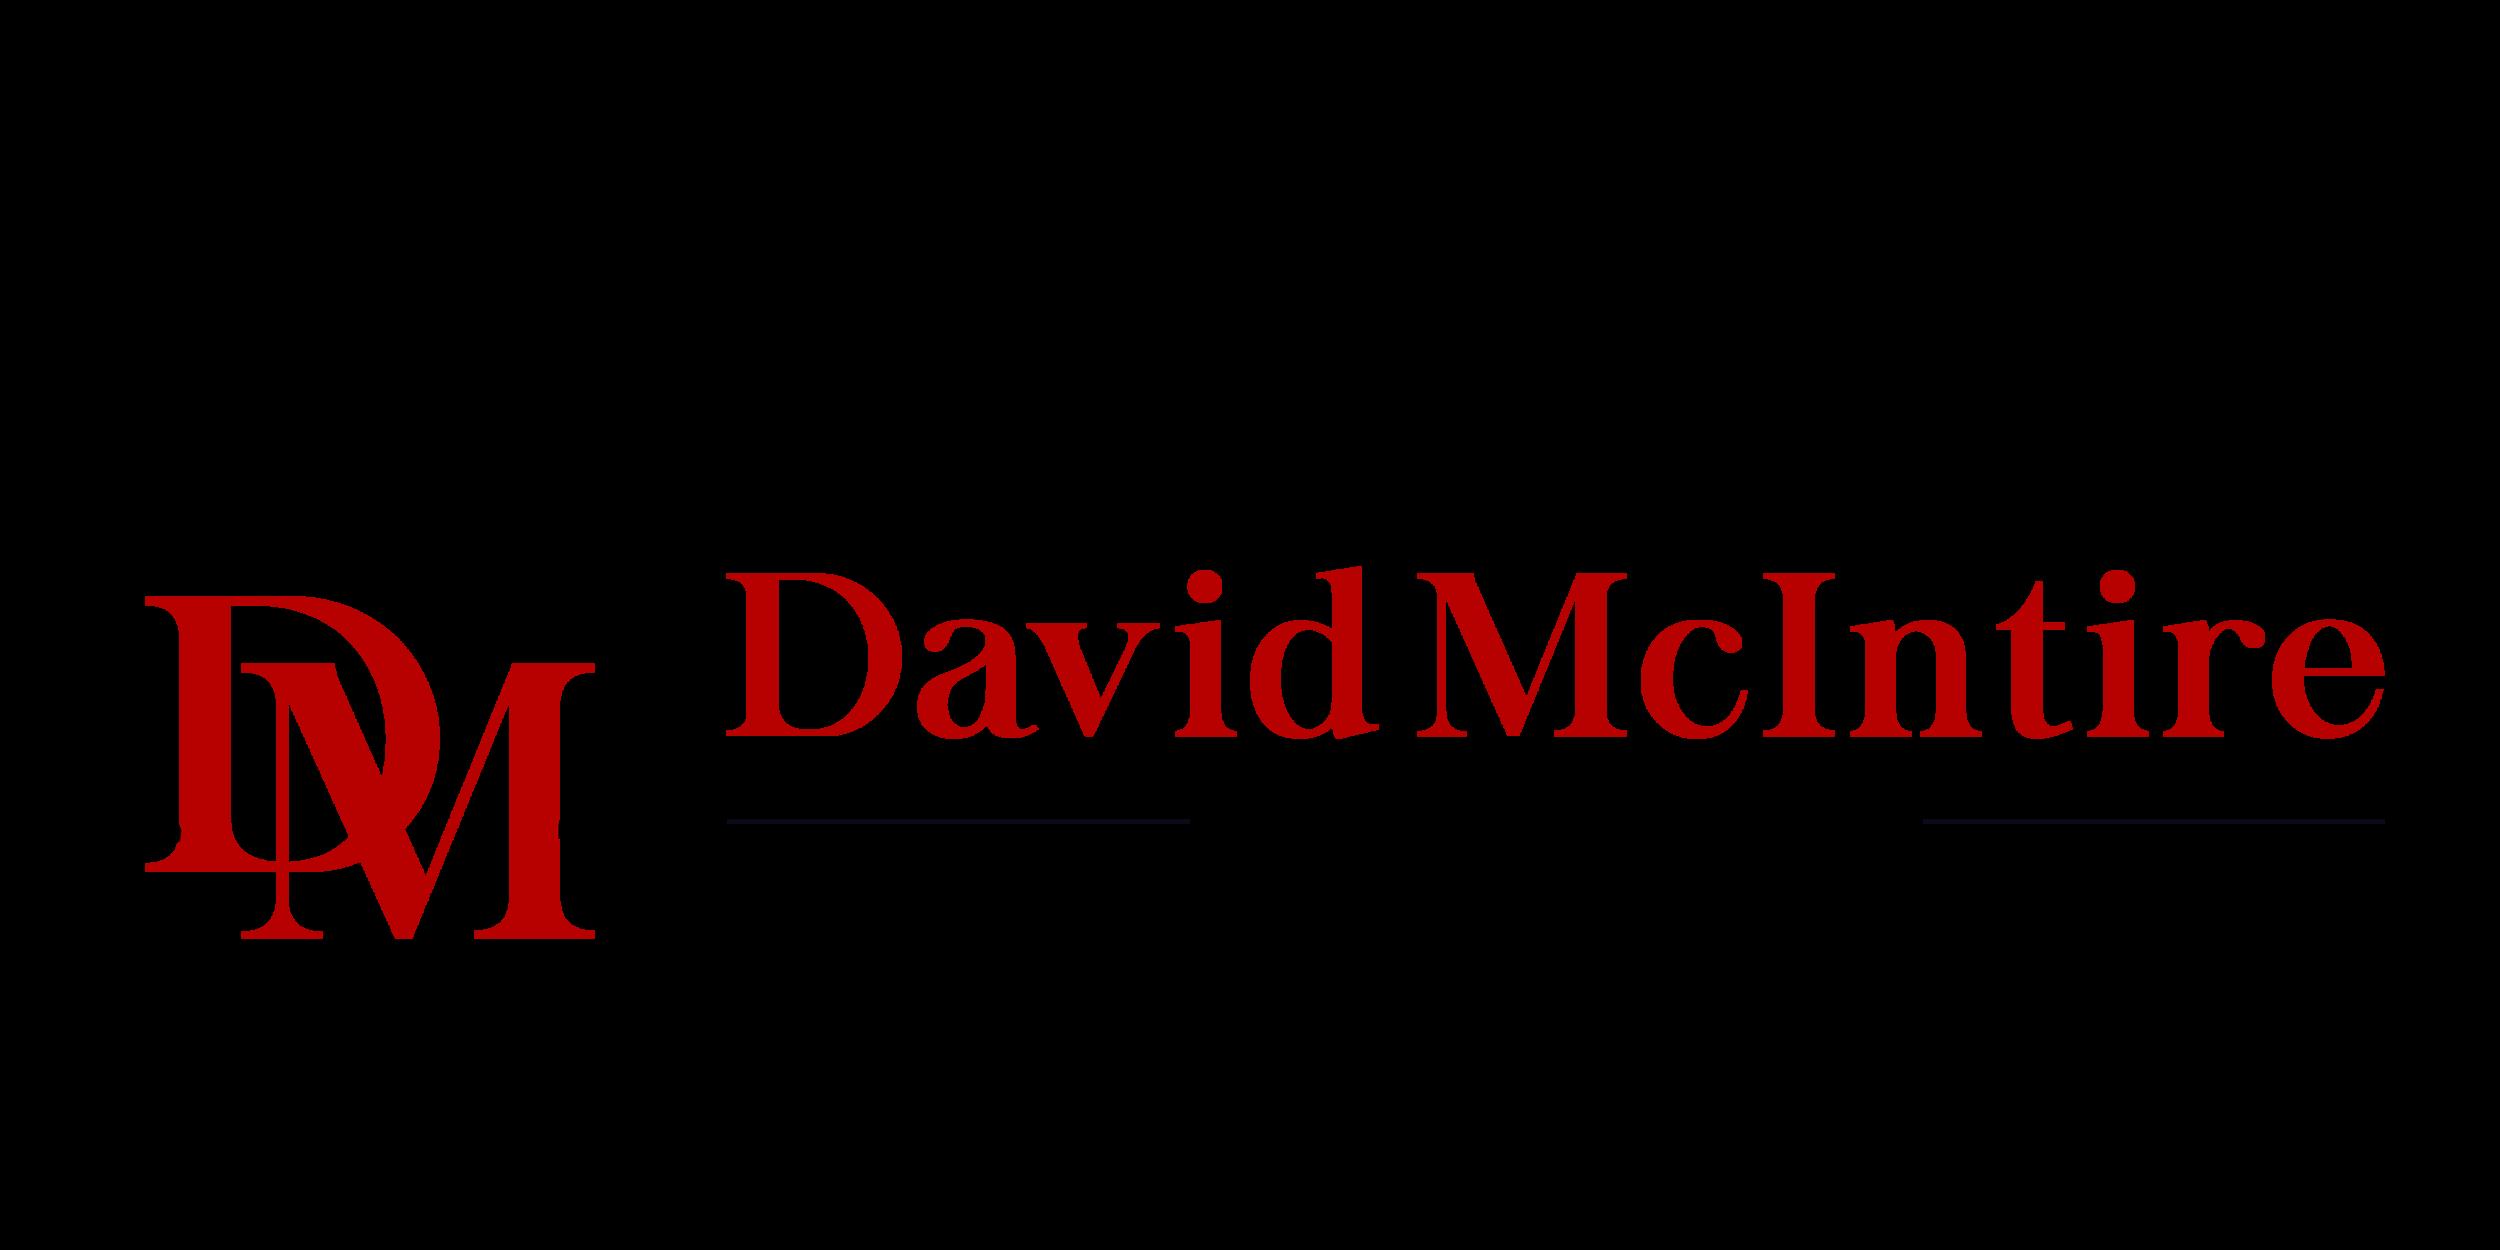 David_McIntire Realtor Logo Name Title.png